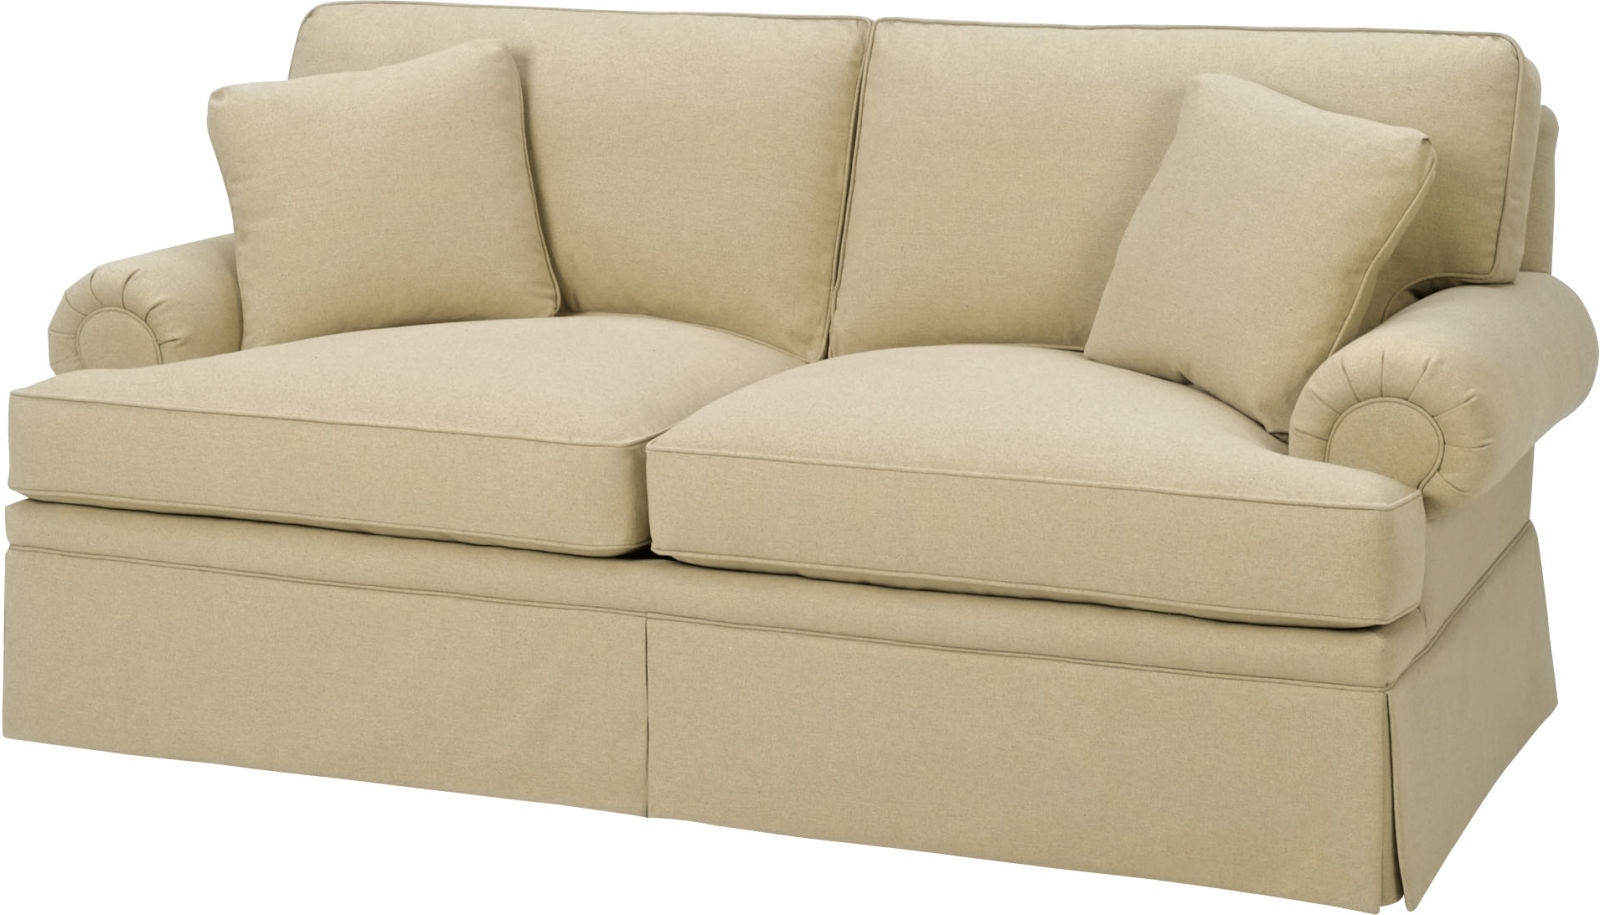 wesley hall sofas fabric corner uk furniture hickory nc product page 1188